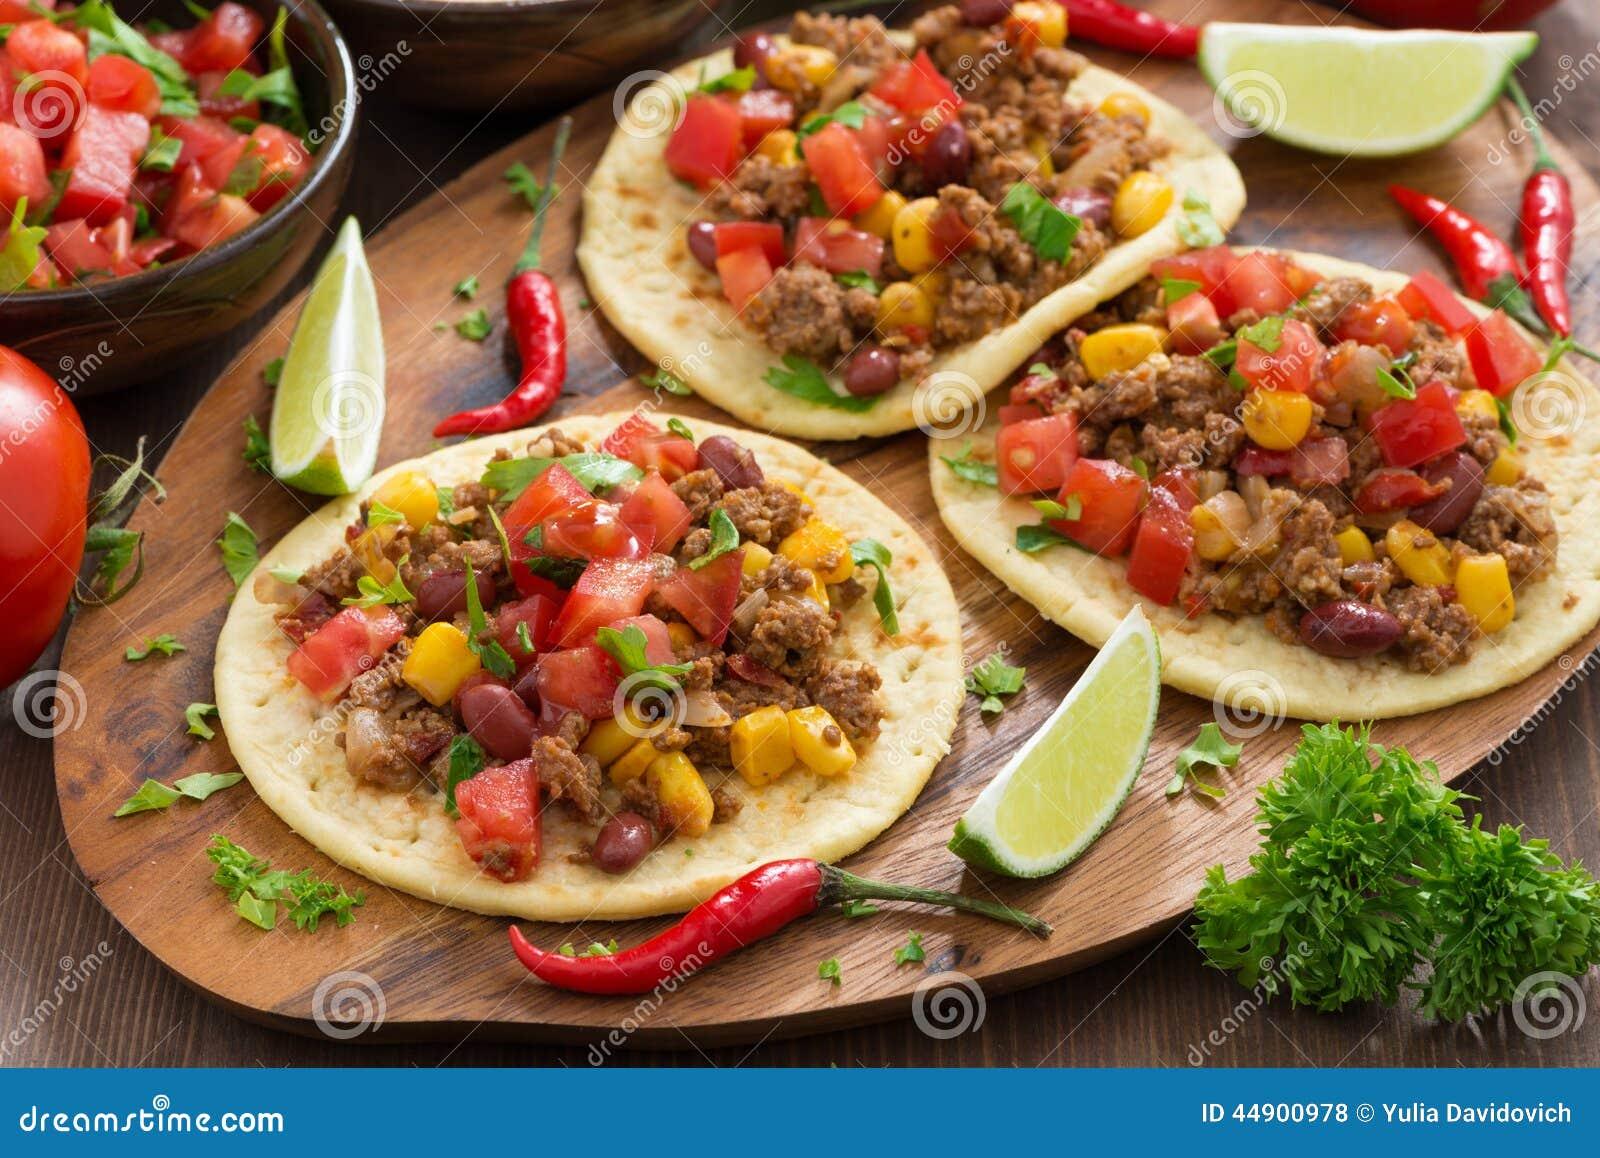 mexikanische k che tortillas und chili con carne und tomatensalsa stockfoto bild 44900978. Black Bedroom Furniture Sets. Home Design Ideas